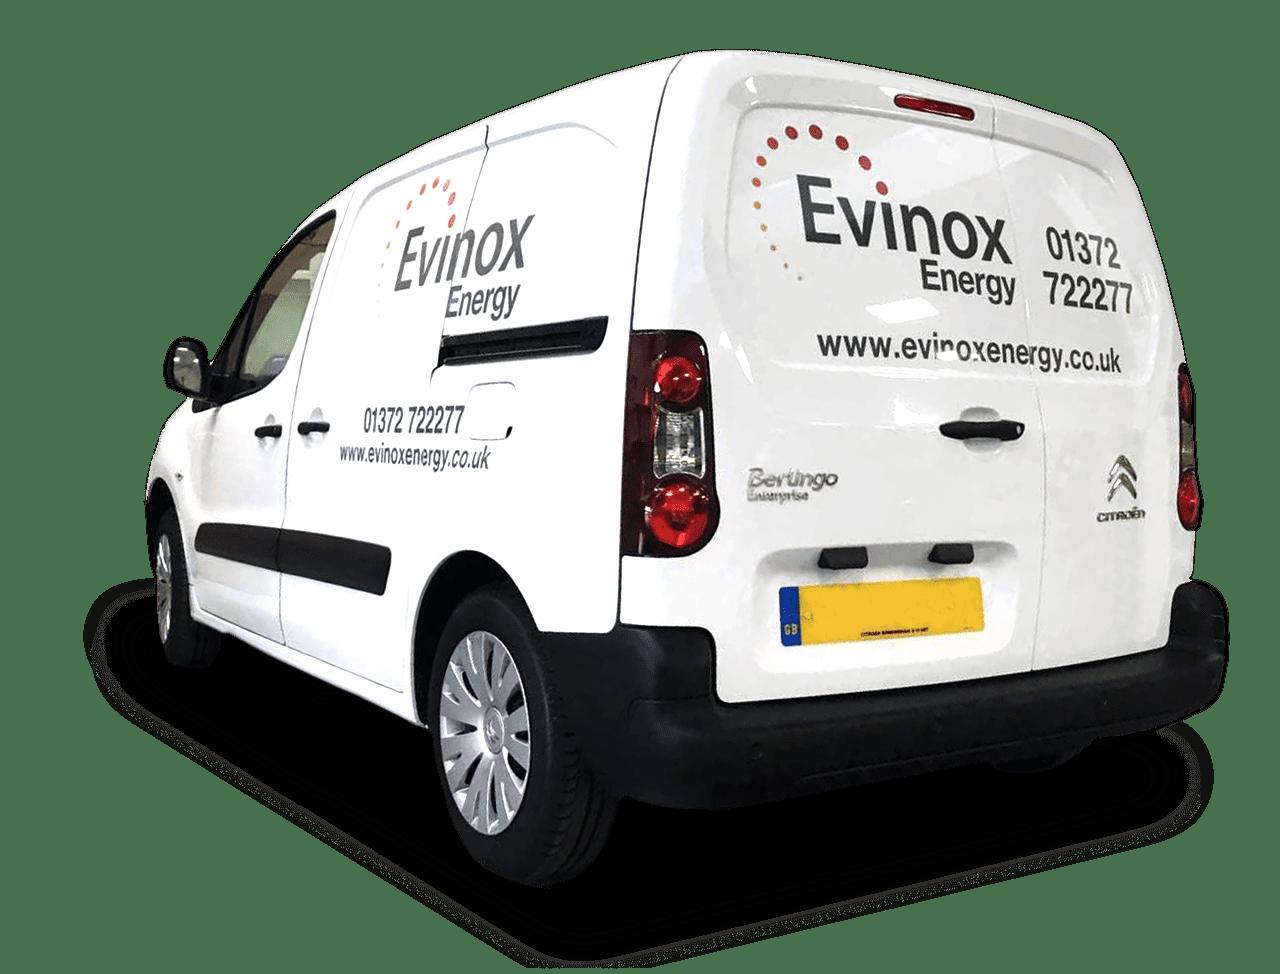 Evinox Service and Maintenance Van